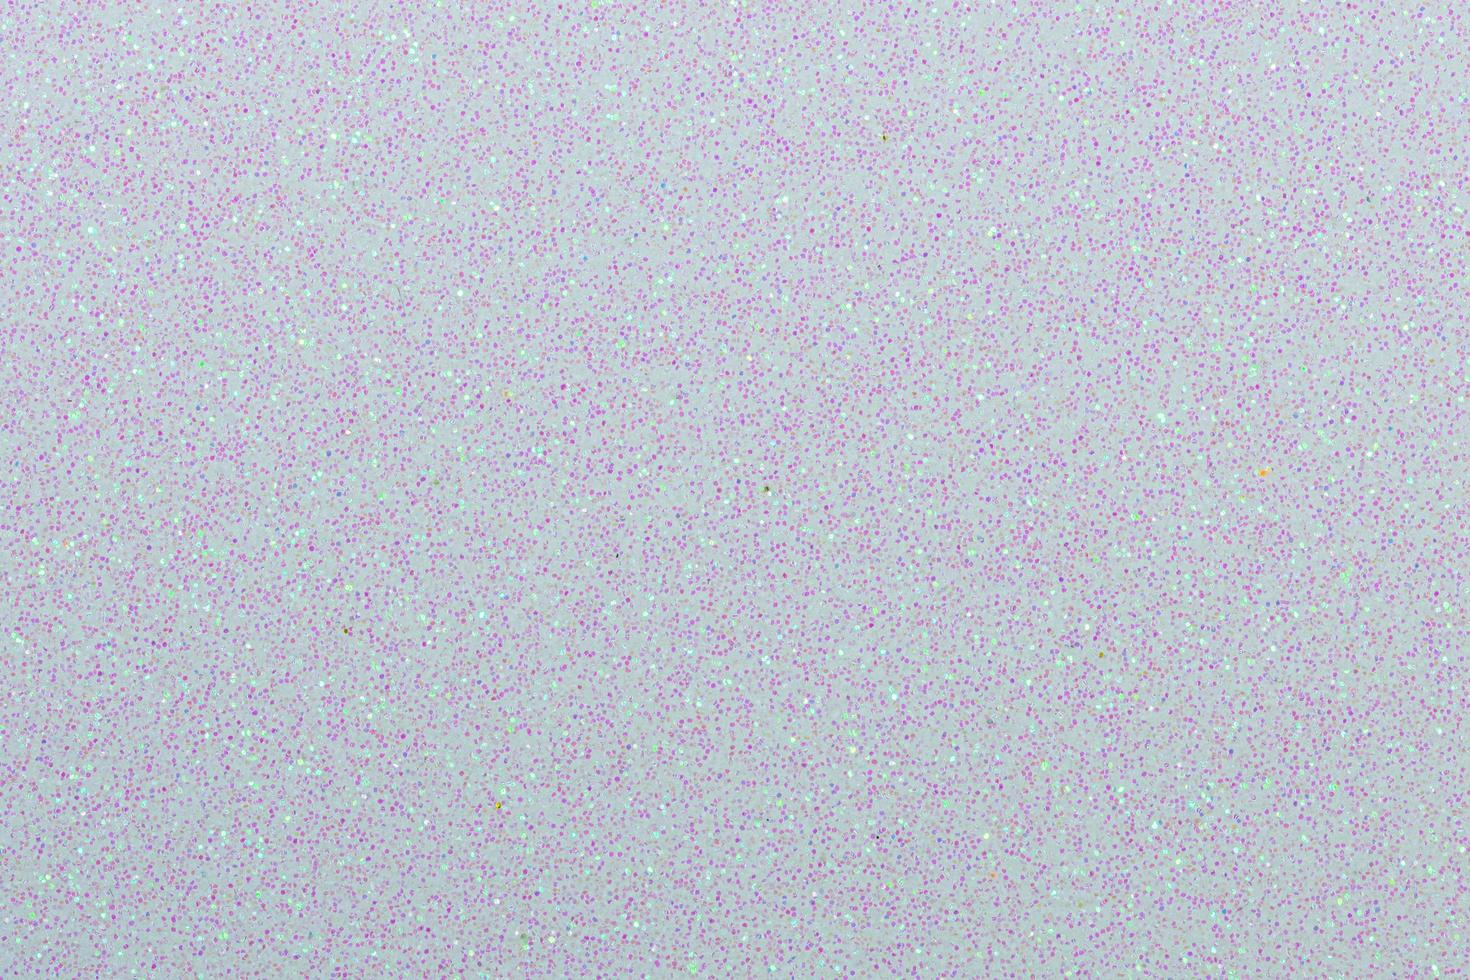 sfondo di carta morbida glitter bianca foto